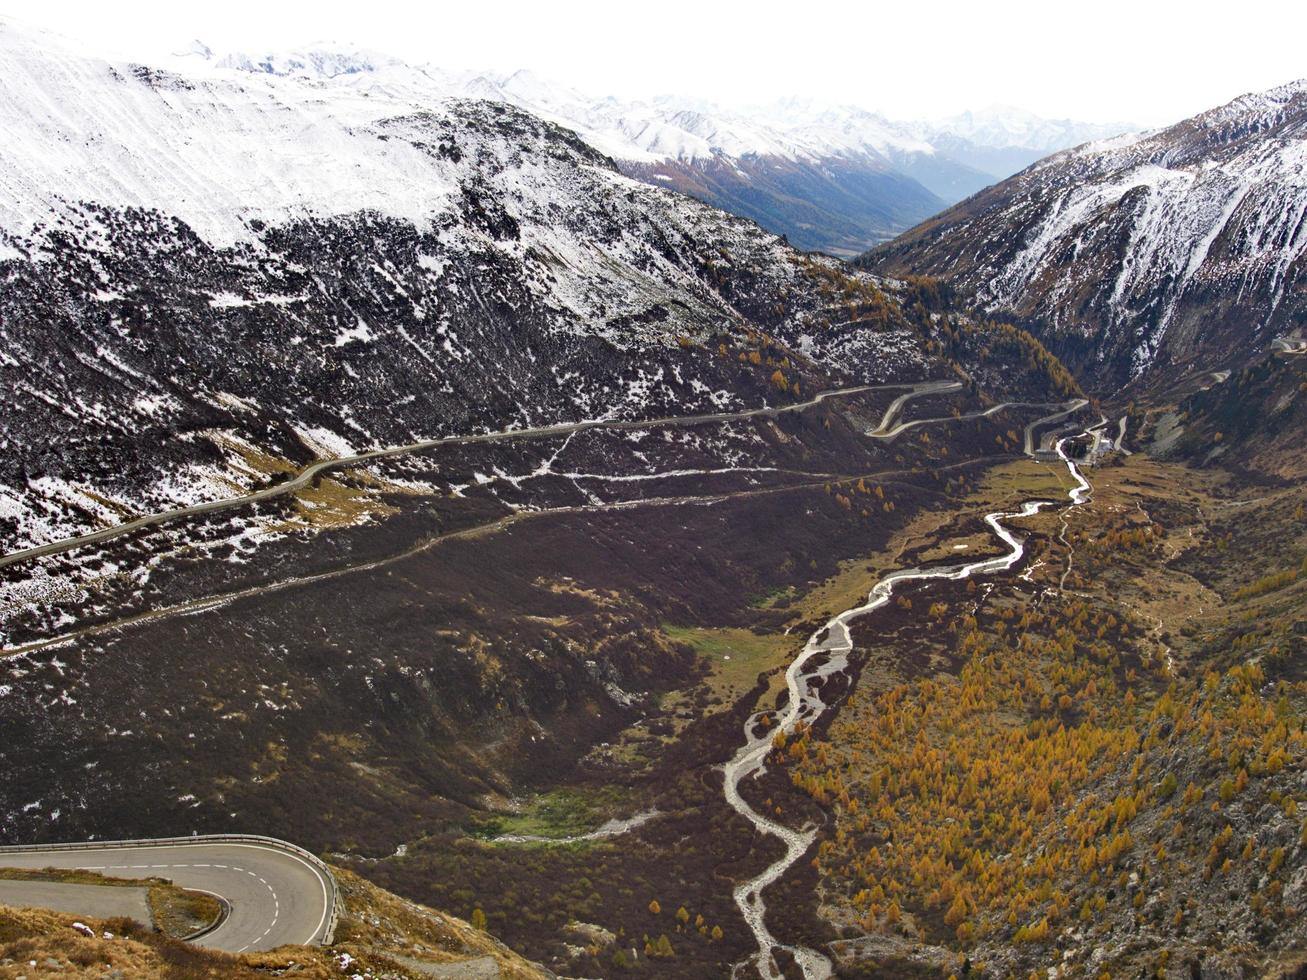 veduta aerea di montagne innevate foto